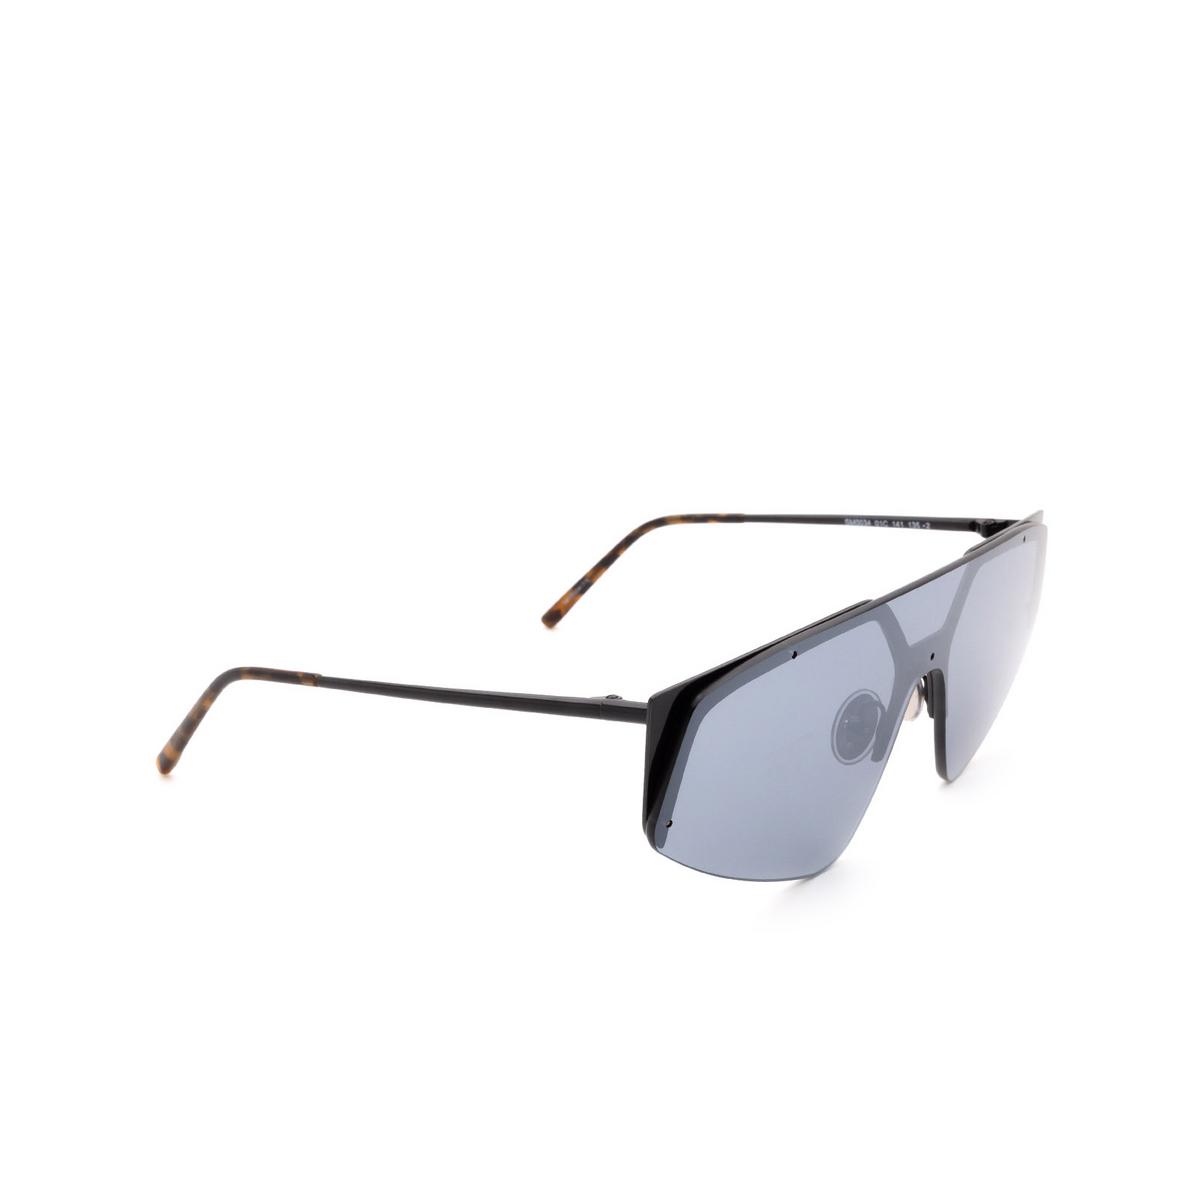 Sportmax® Mask Sunglasses: SM0034 color Black 01C - three-quarters view.